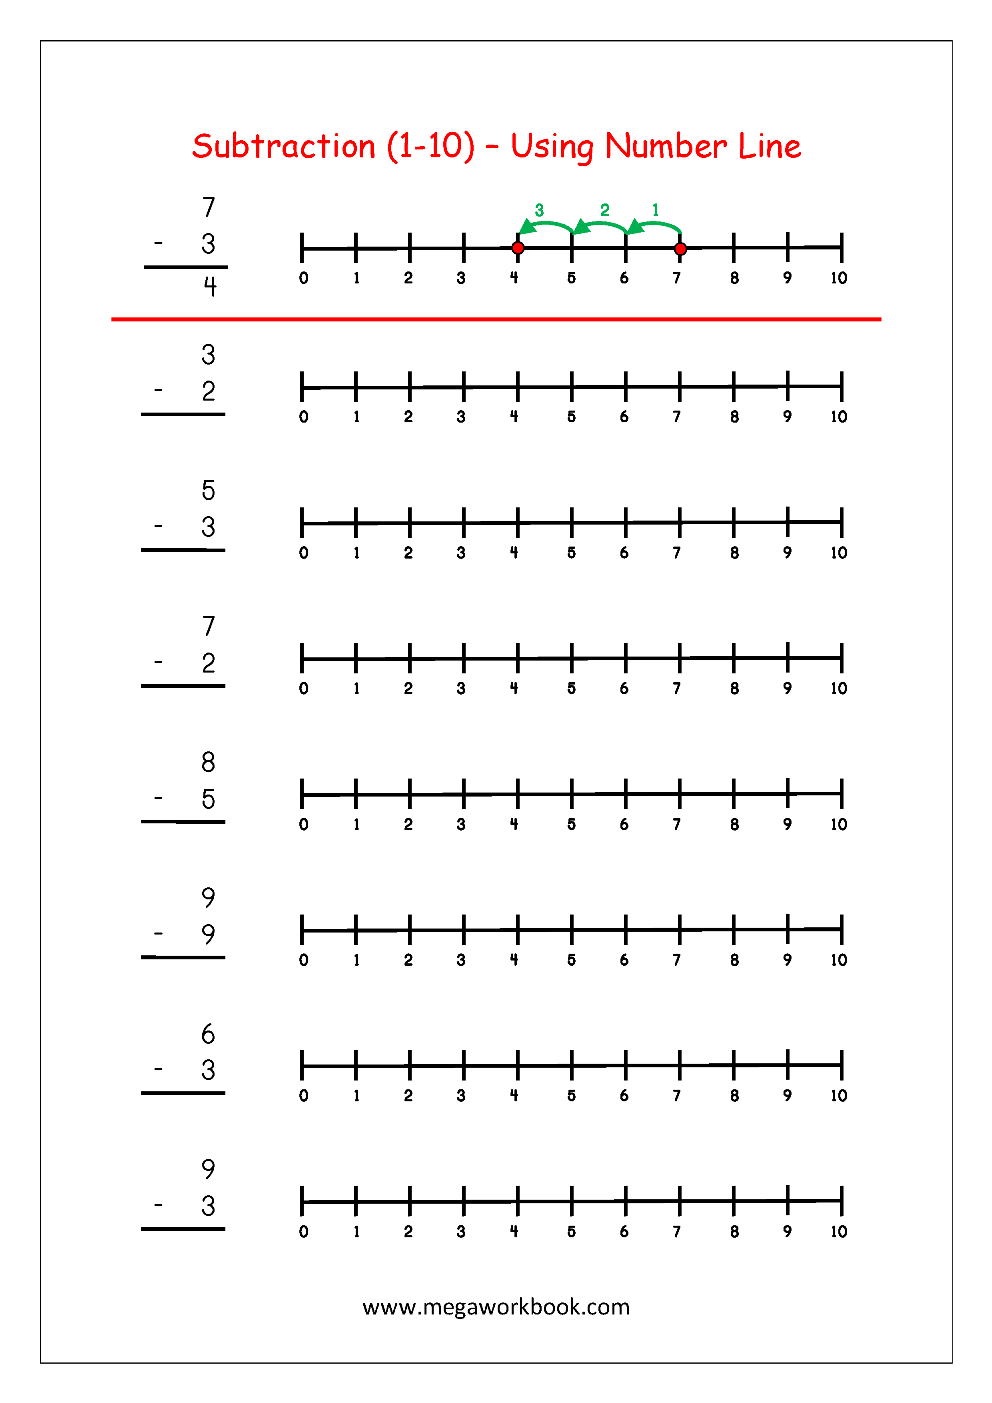 Subtraction Worksheets For Grade 1 Using Number Line